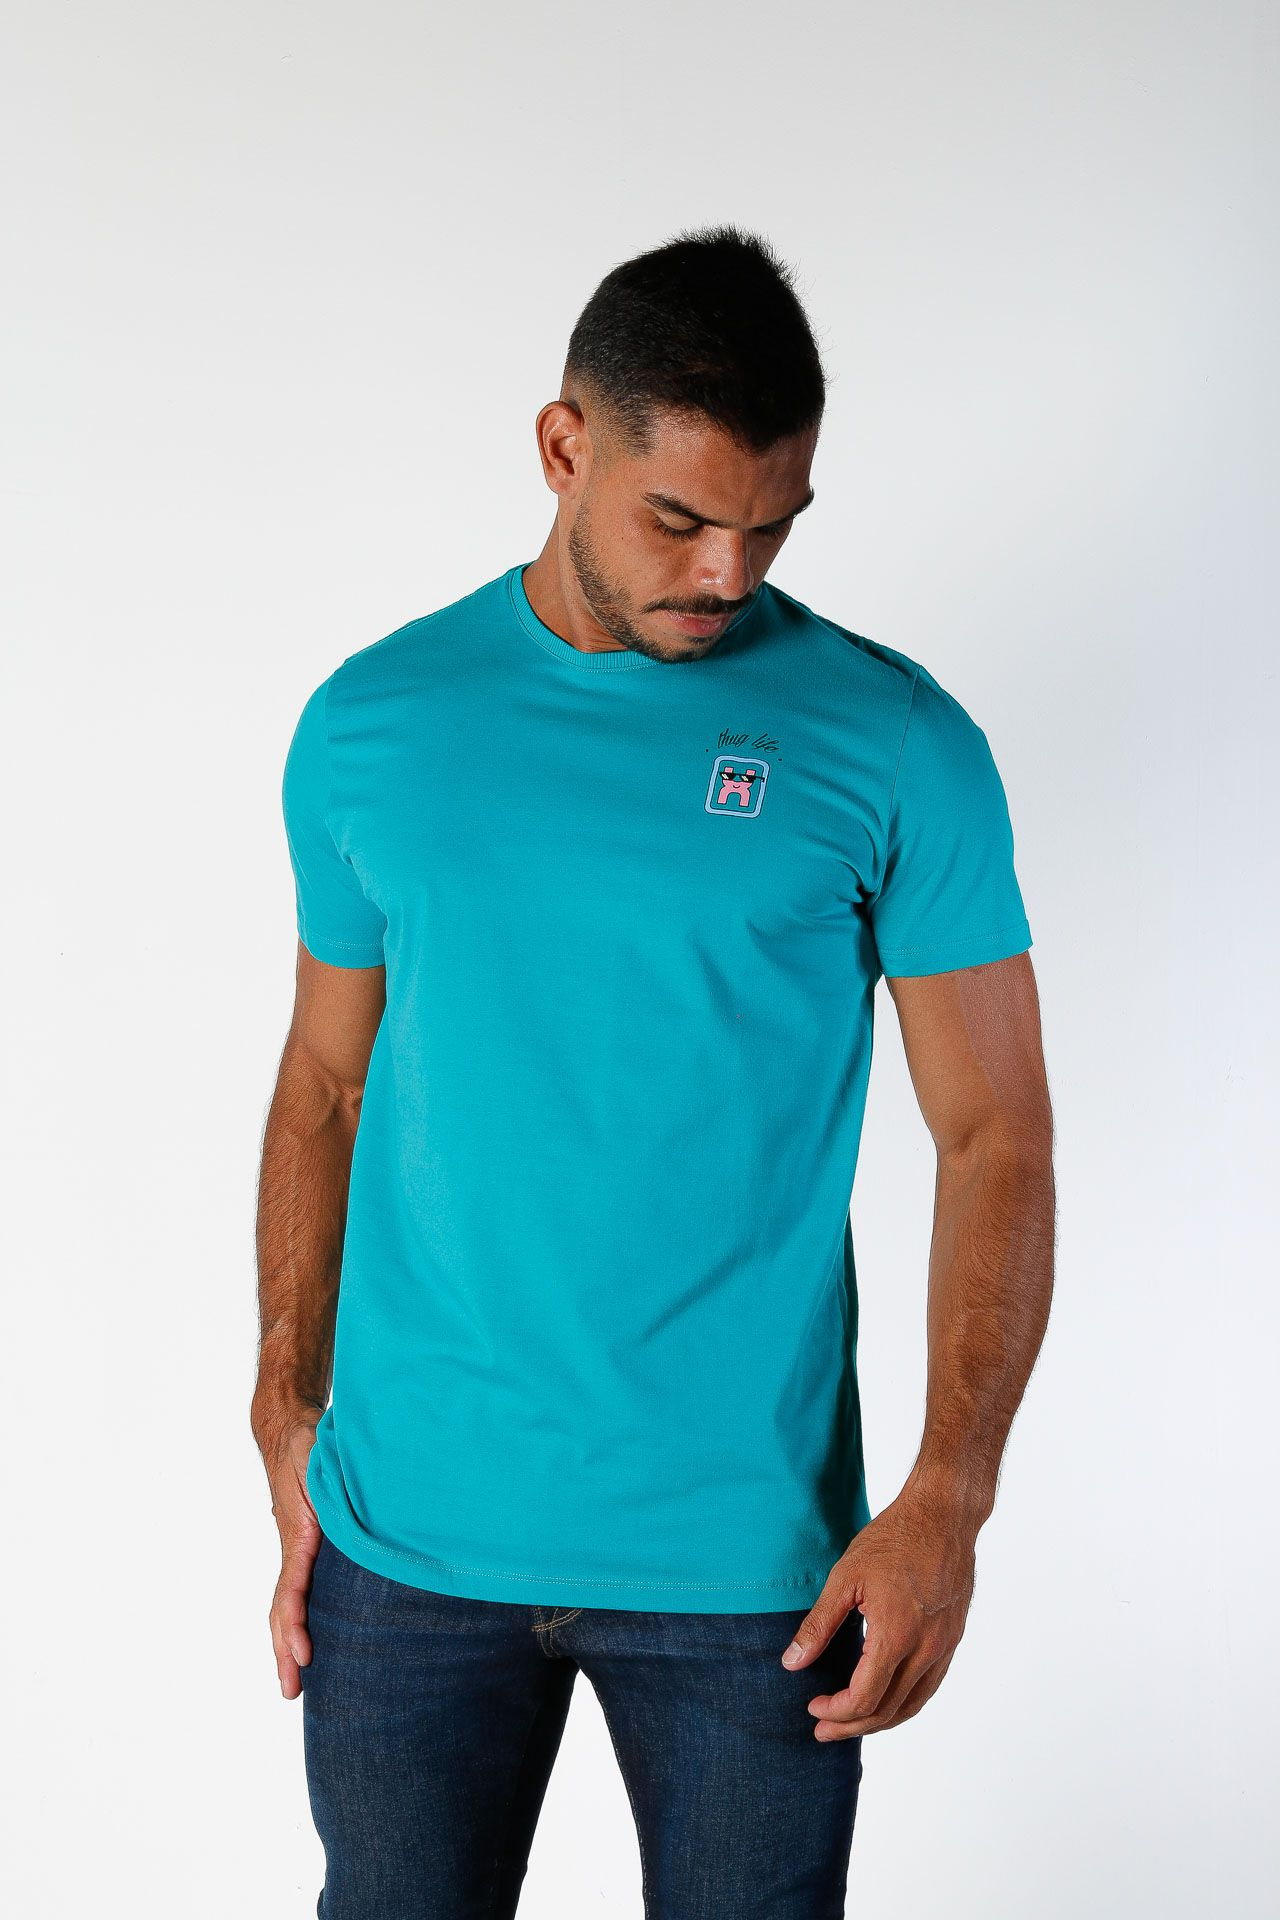 Camiseta Masculina TXC 1623